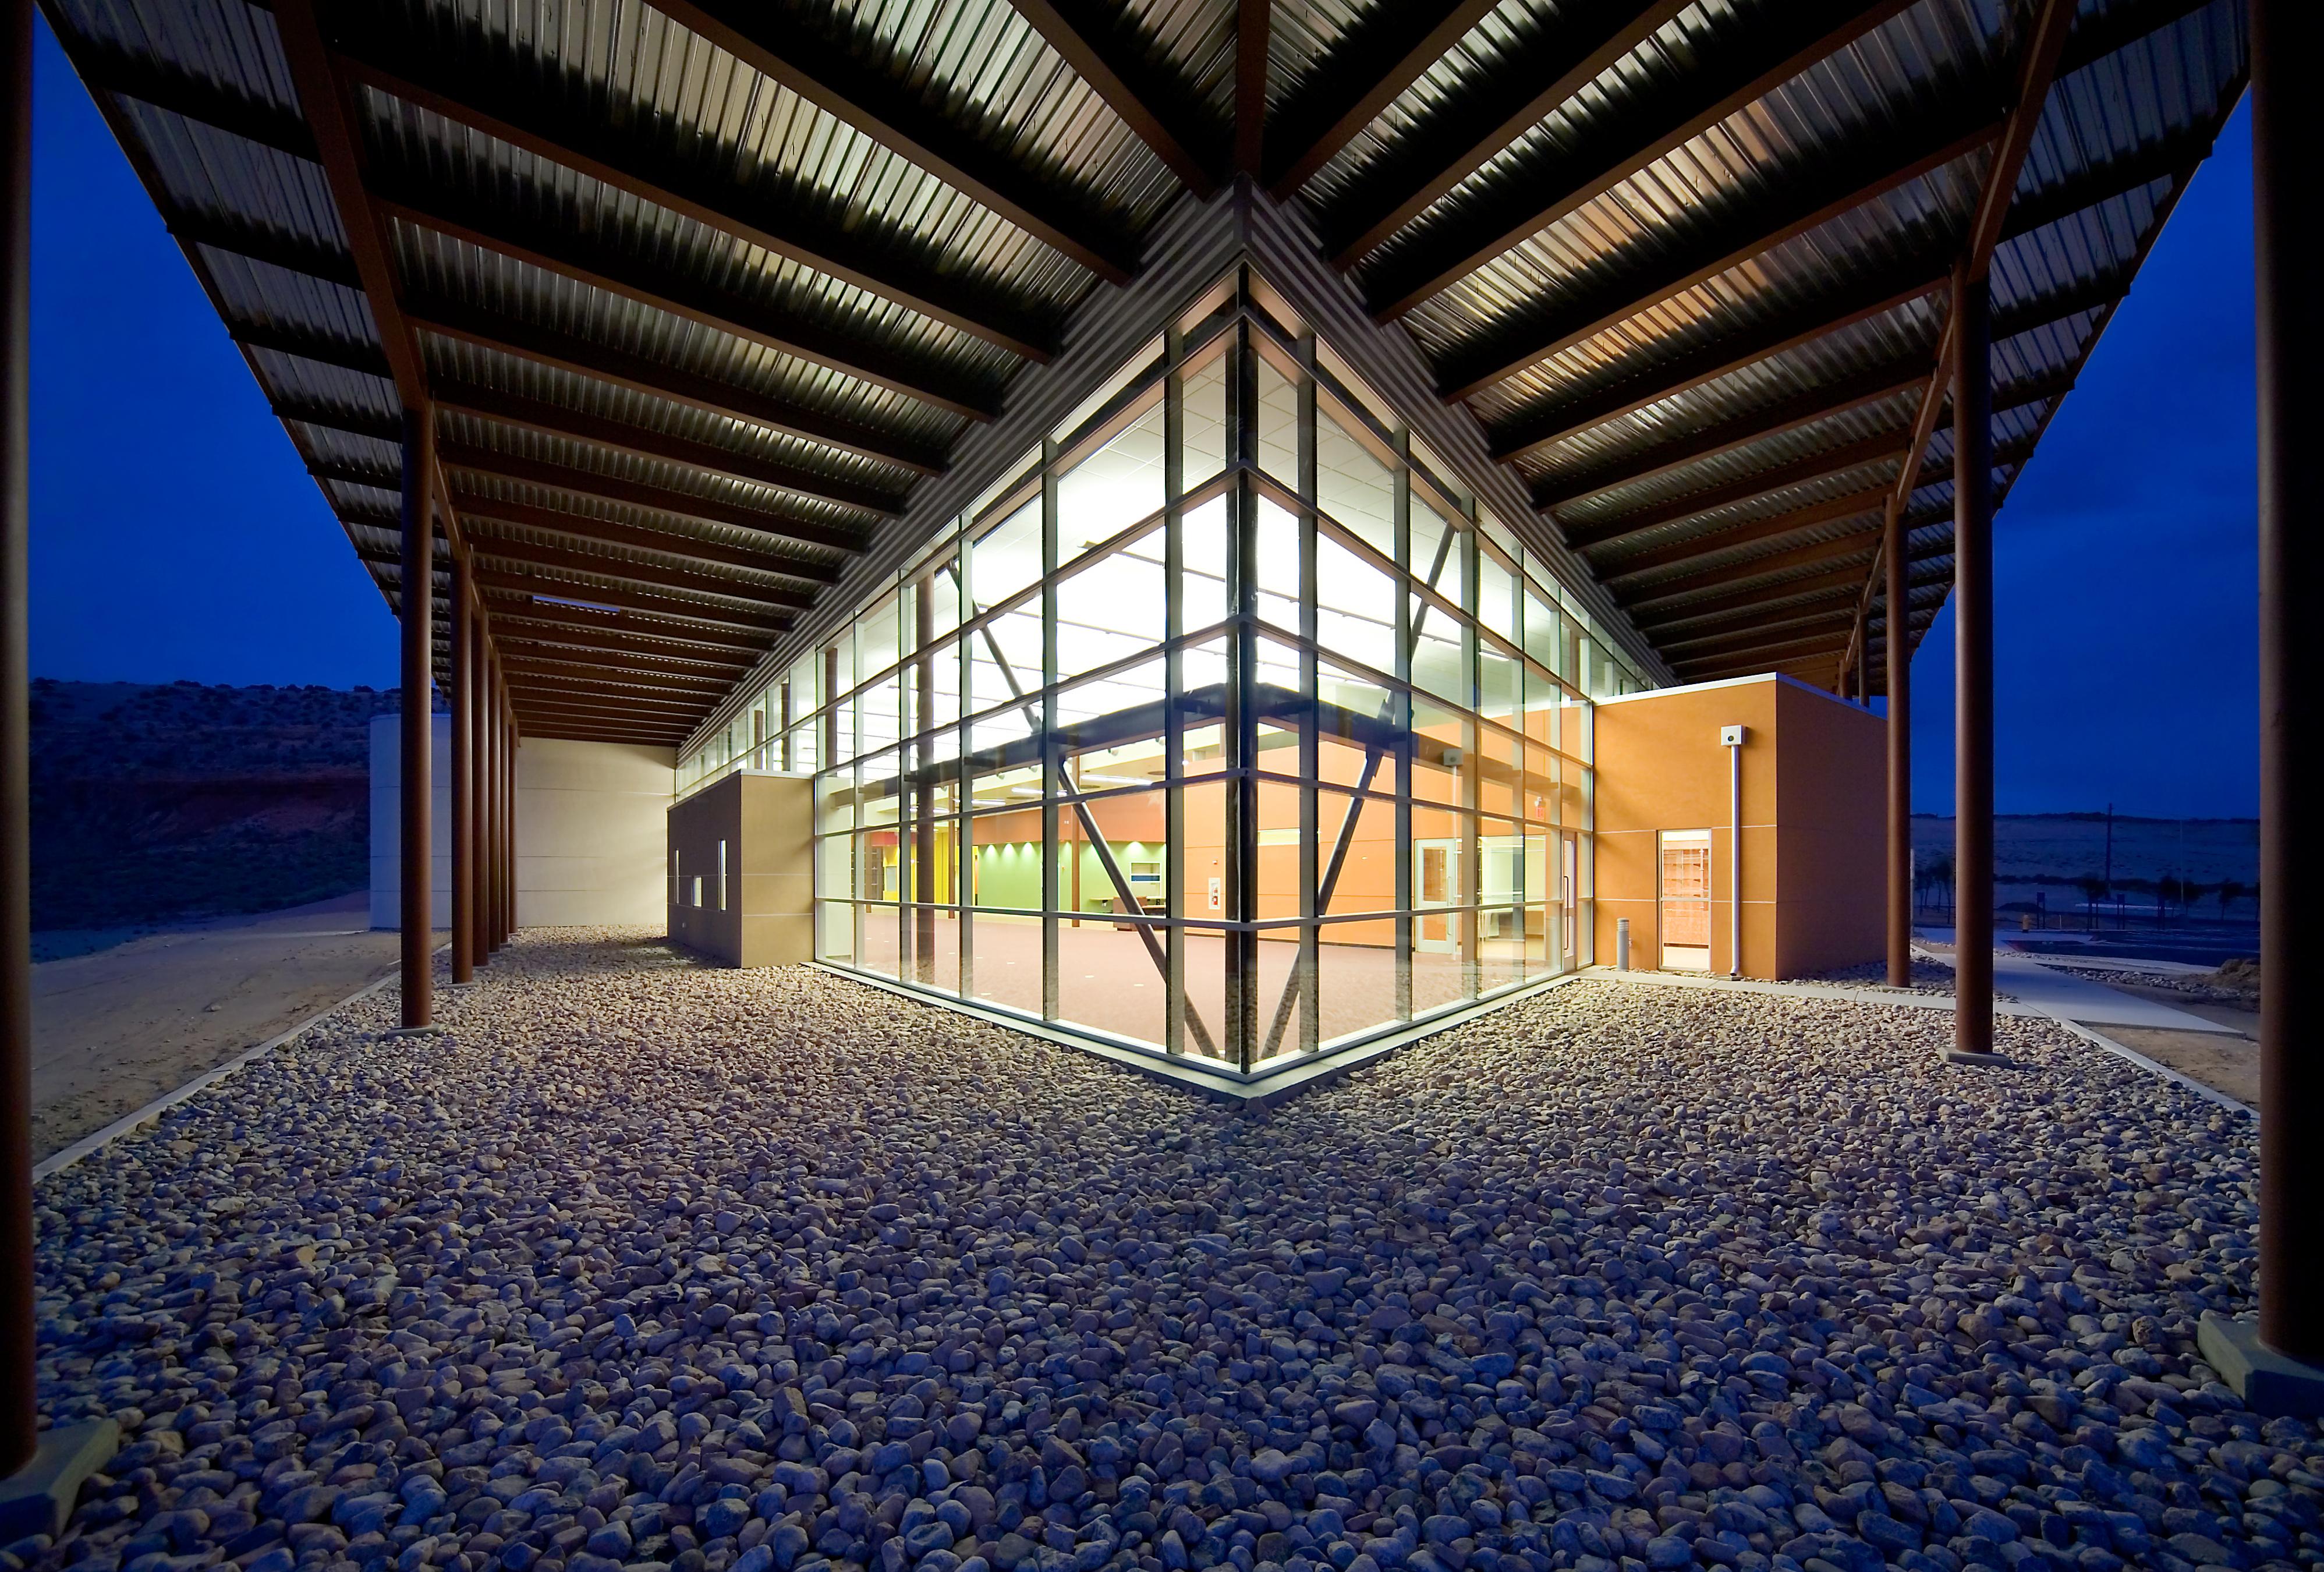 RLG's Rio Rancho Public Library Project